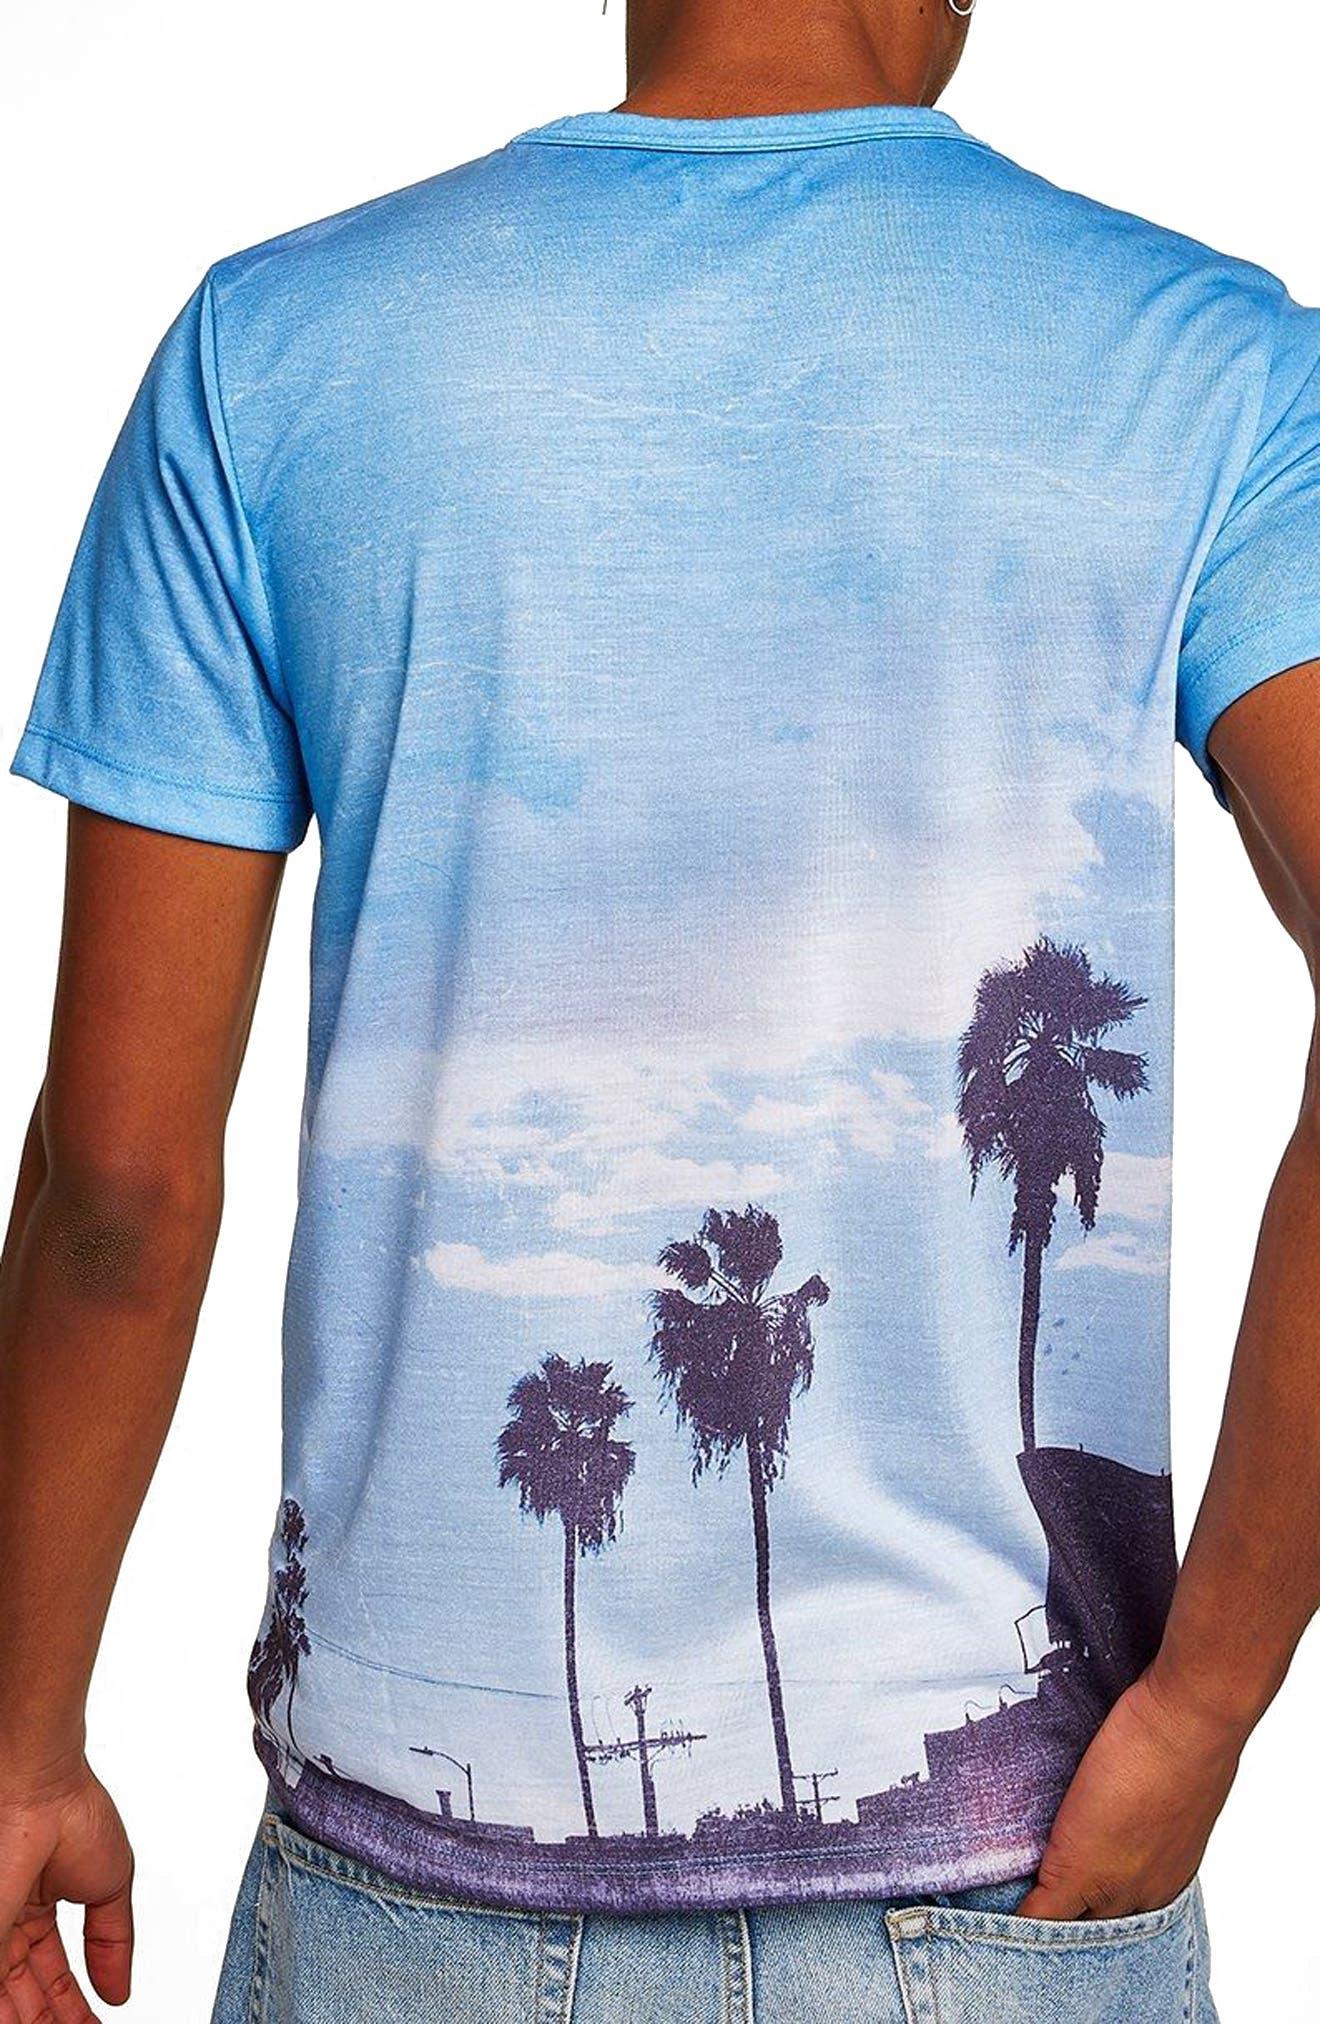 Classic Fit Seclusion Graphic T-Shirt,                             Alternate thumbnail 2, color,                             BLUE MULTI